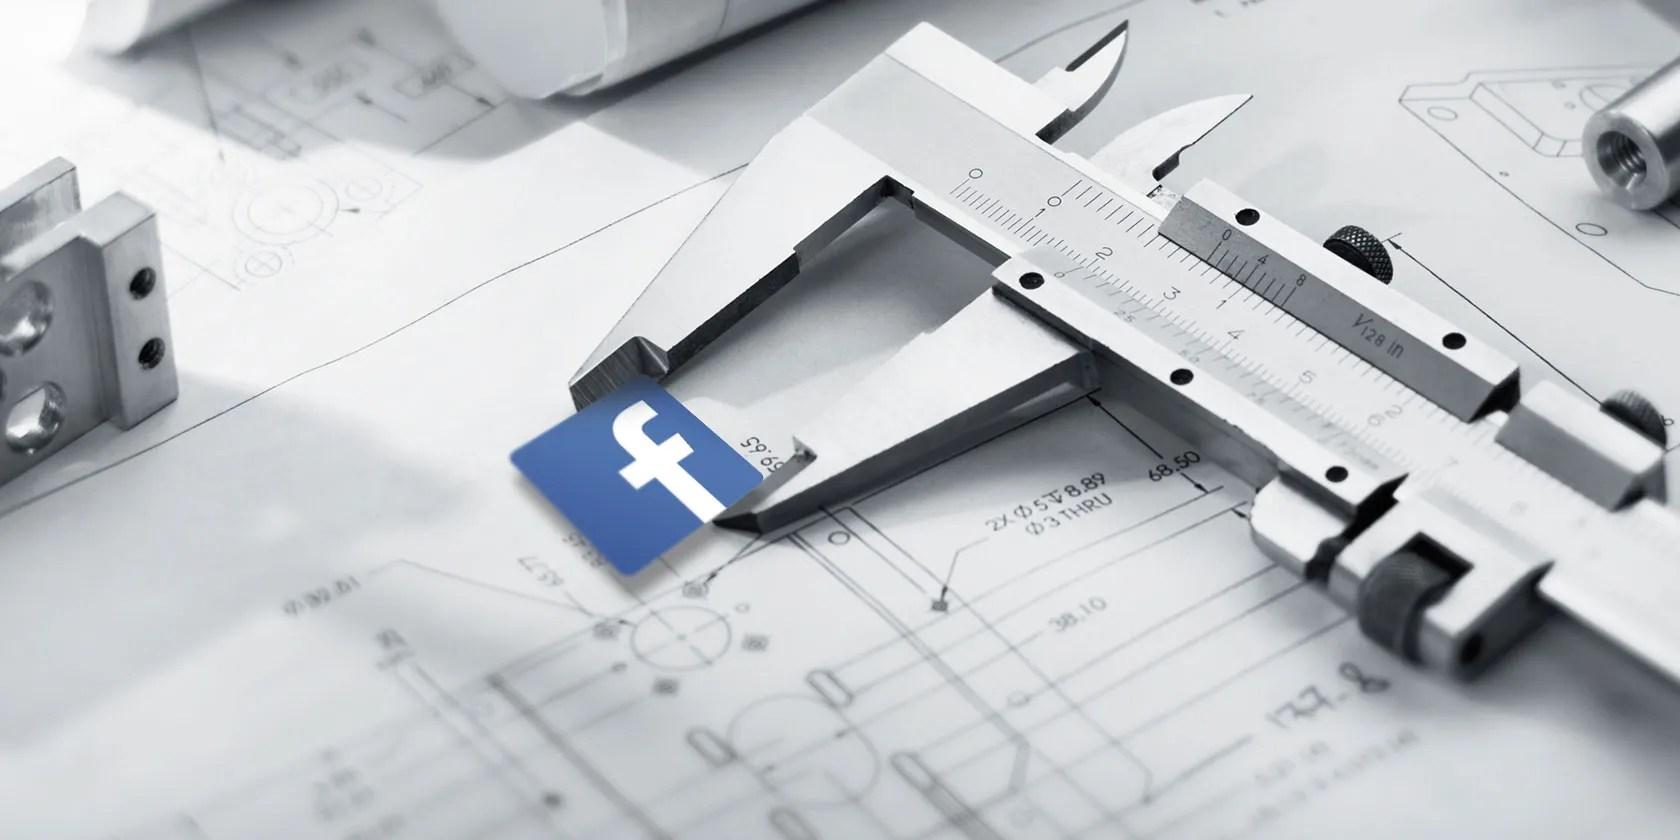 facebook-image-dimensioni del 2018